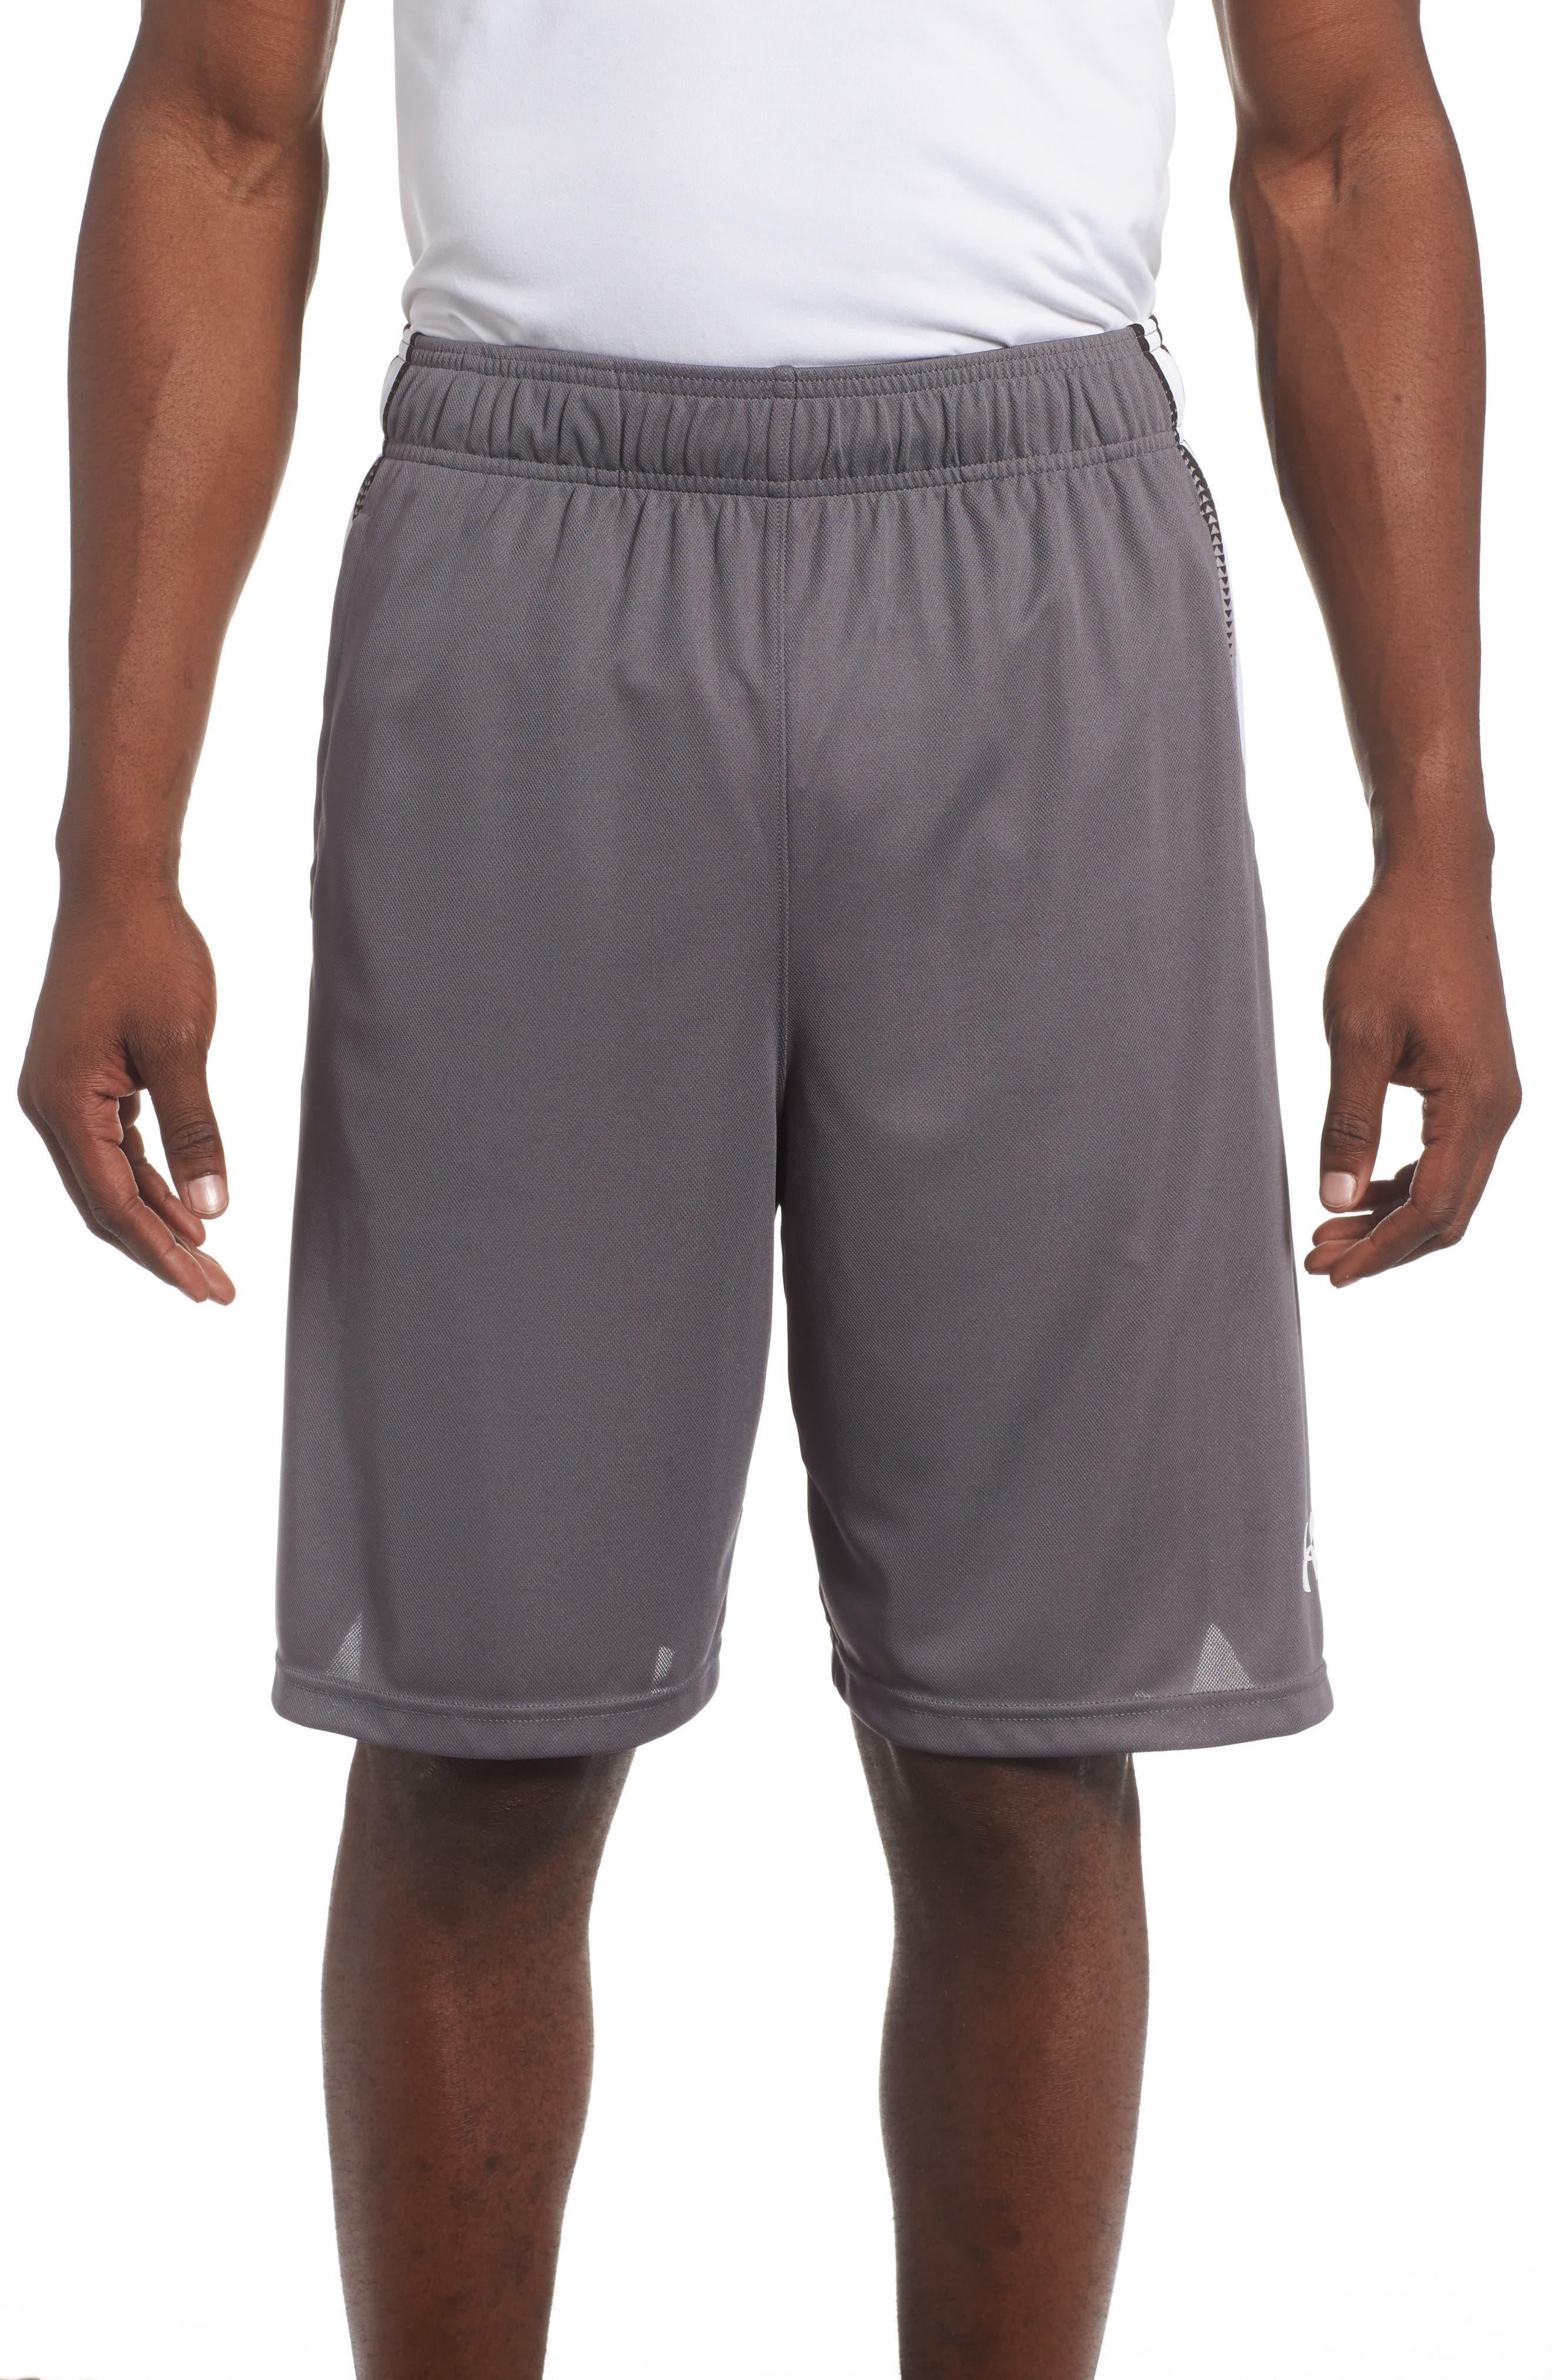 Select Basketball Shorts,                         Main,                         color, Graphite/ White